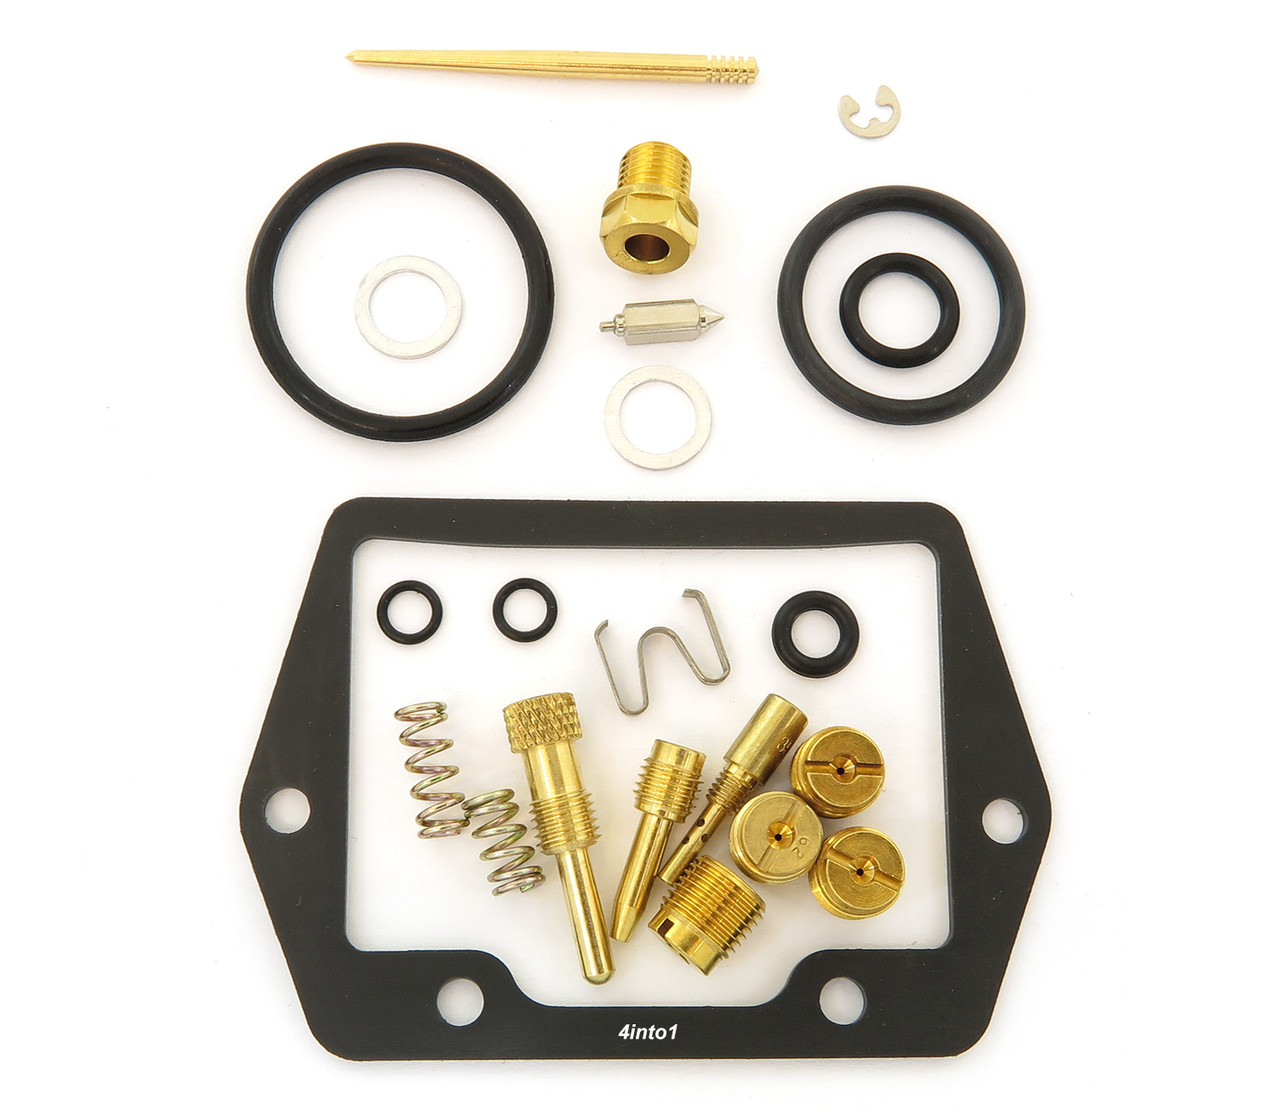 Wiring Harness Honda Ct90 K4 Electrical Diagrams Lifan Diagram Carburetor Rebuild Kit 1970 1975 Tail Light